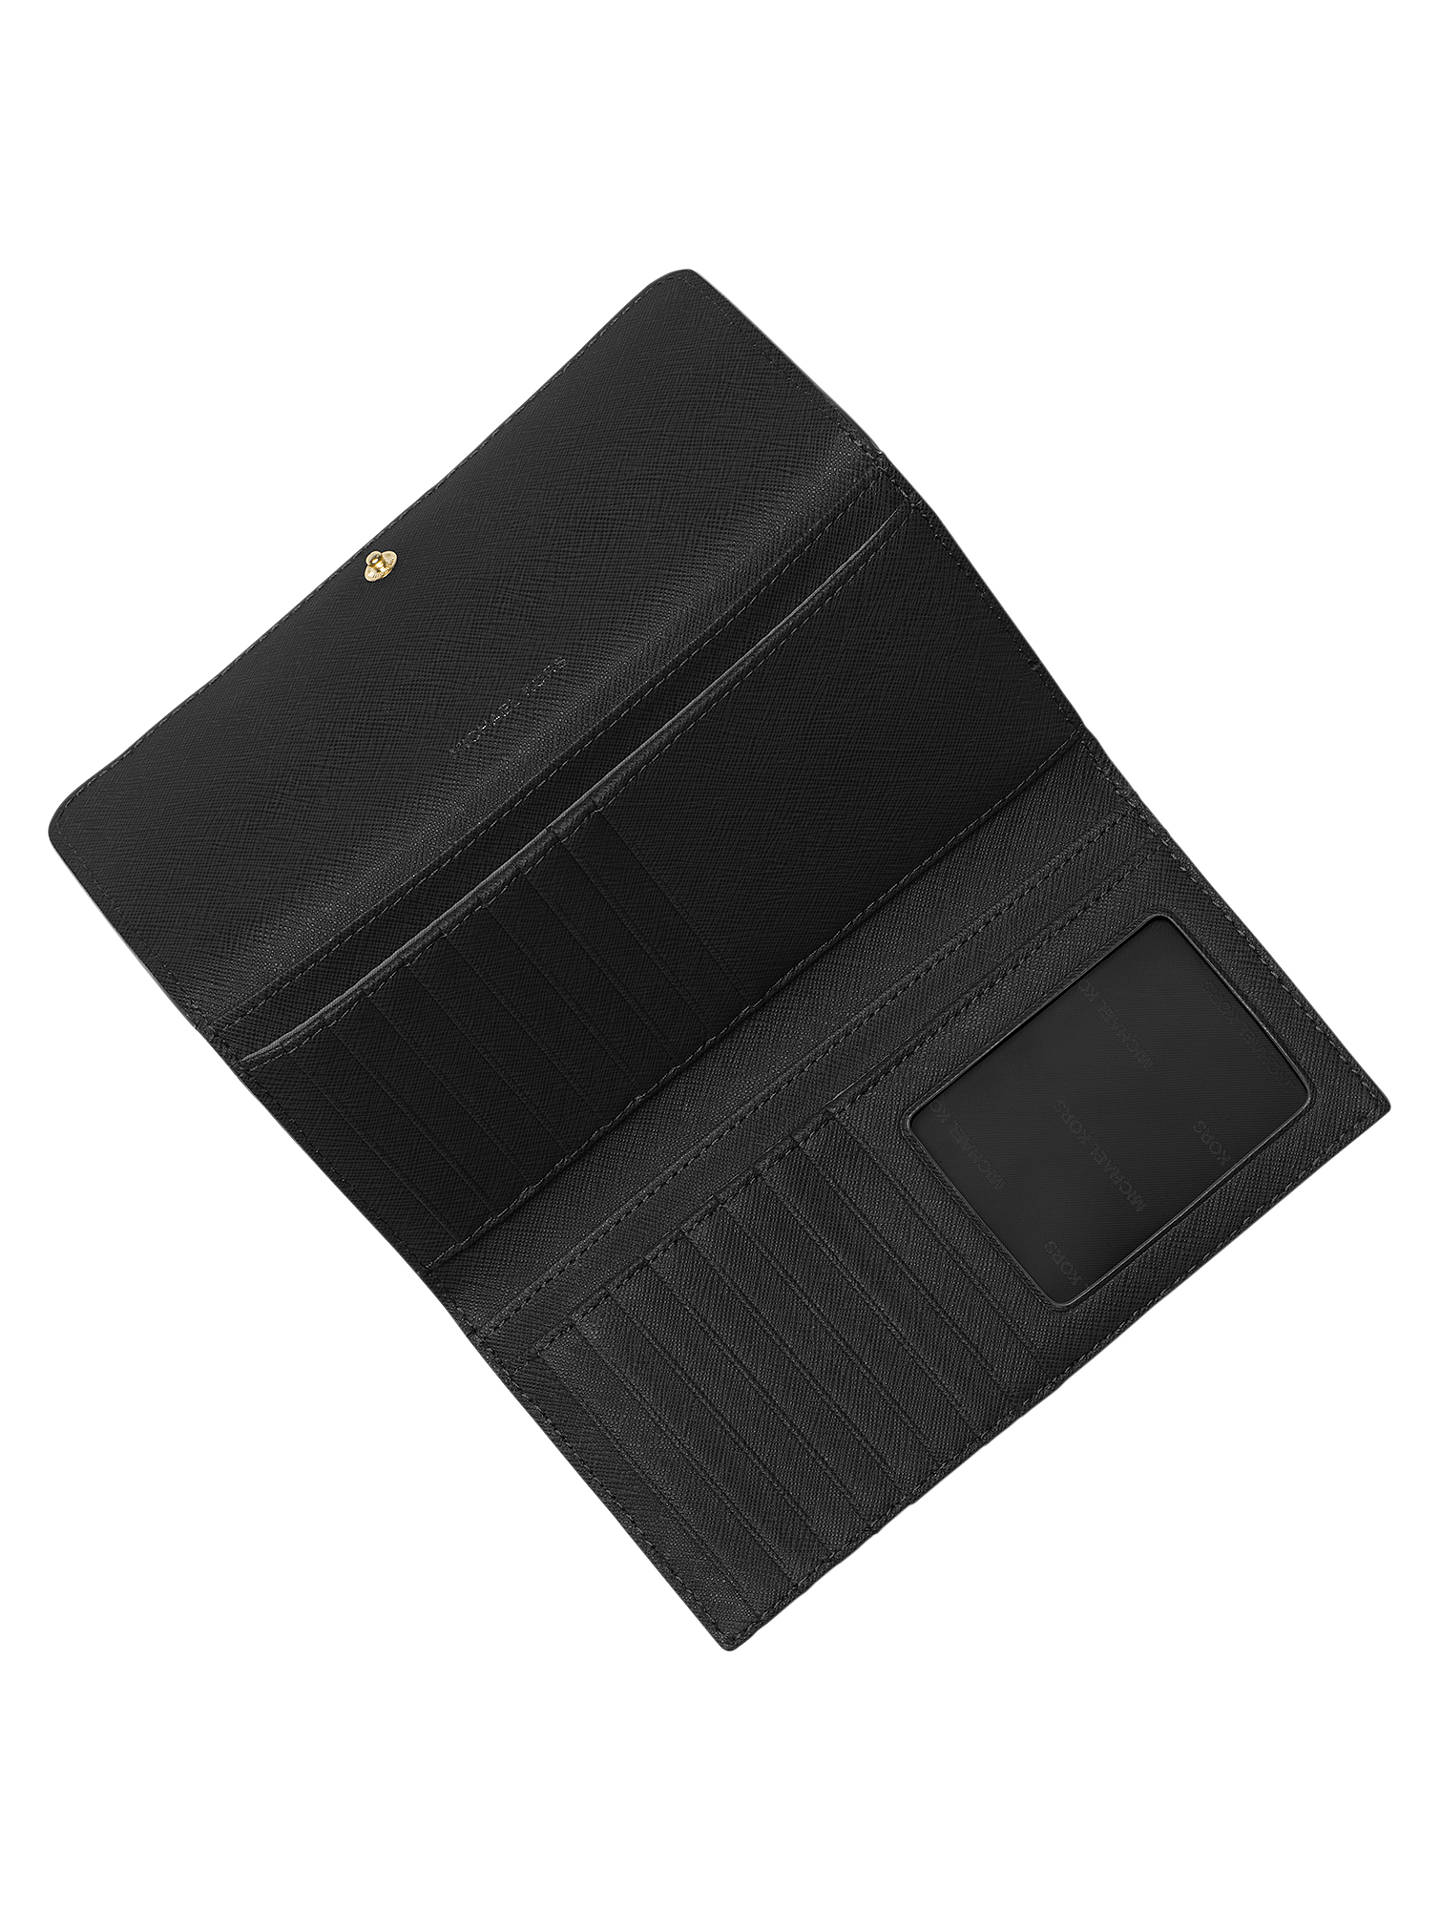 2efc4a4236da ... Buy MICHAEL Michael Kors Mercer Leather Large Trifold Purse, Black  Online at johnlewis.com ...